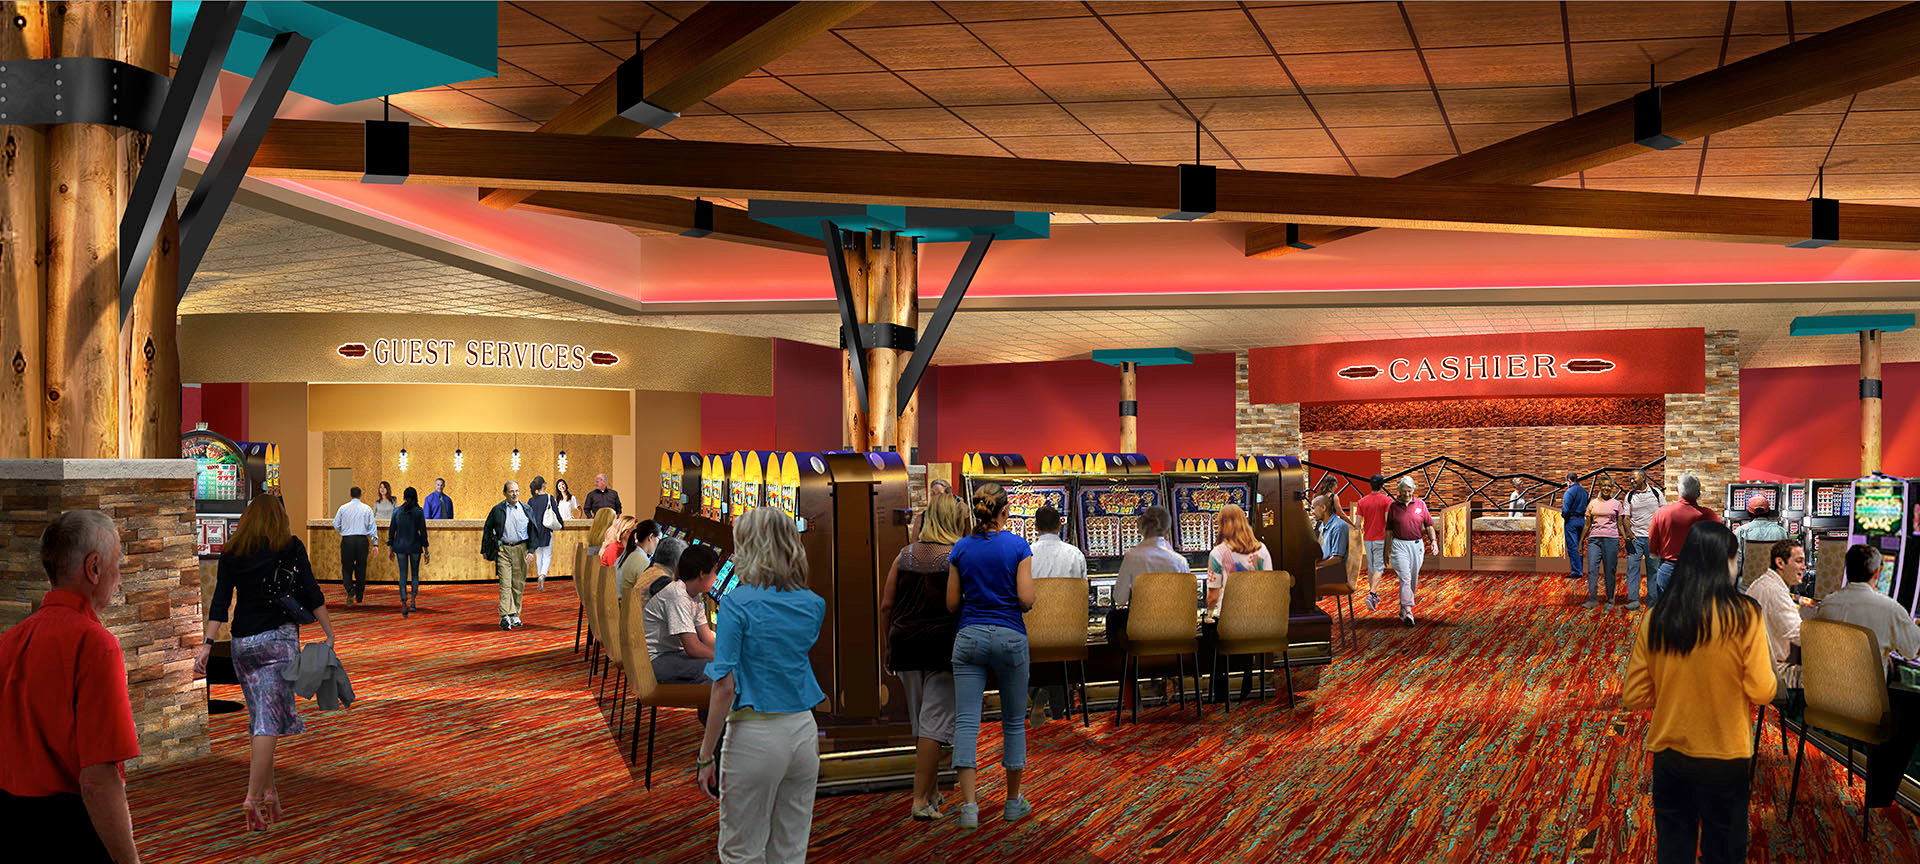 Shoshone Rose Casino and Hotel image 2